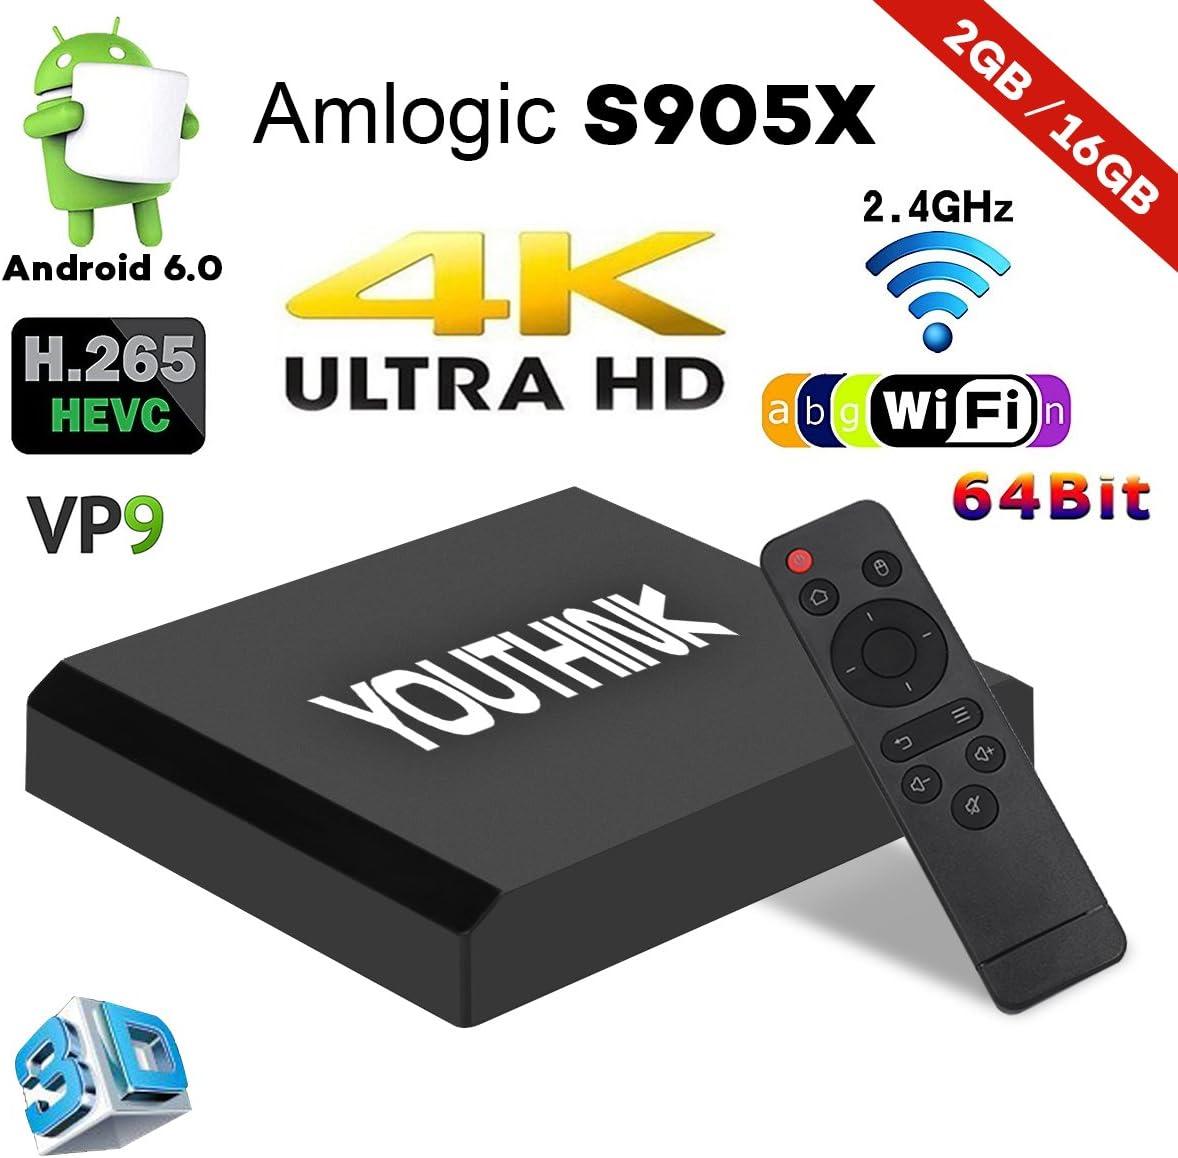 Smart TV Box Android 6,0 TV Box Set 2 GB 16 GB Amlogic s905X CPU Quad Core A53 Procesador de 64 bits WiFi/1080p/4K con HDMI/USB/AV/Tarjeta TF: Amazon.es: Electrónica